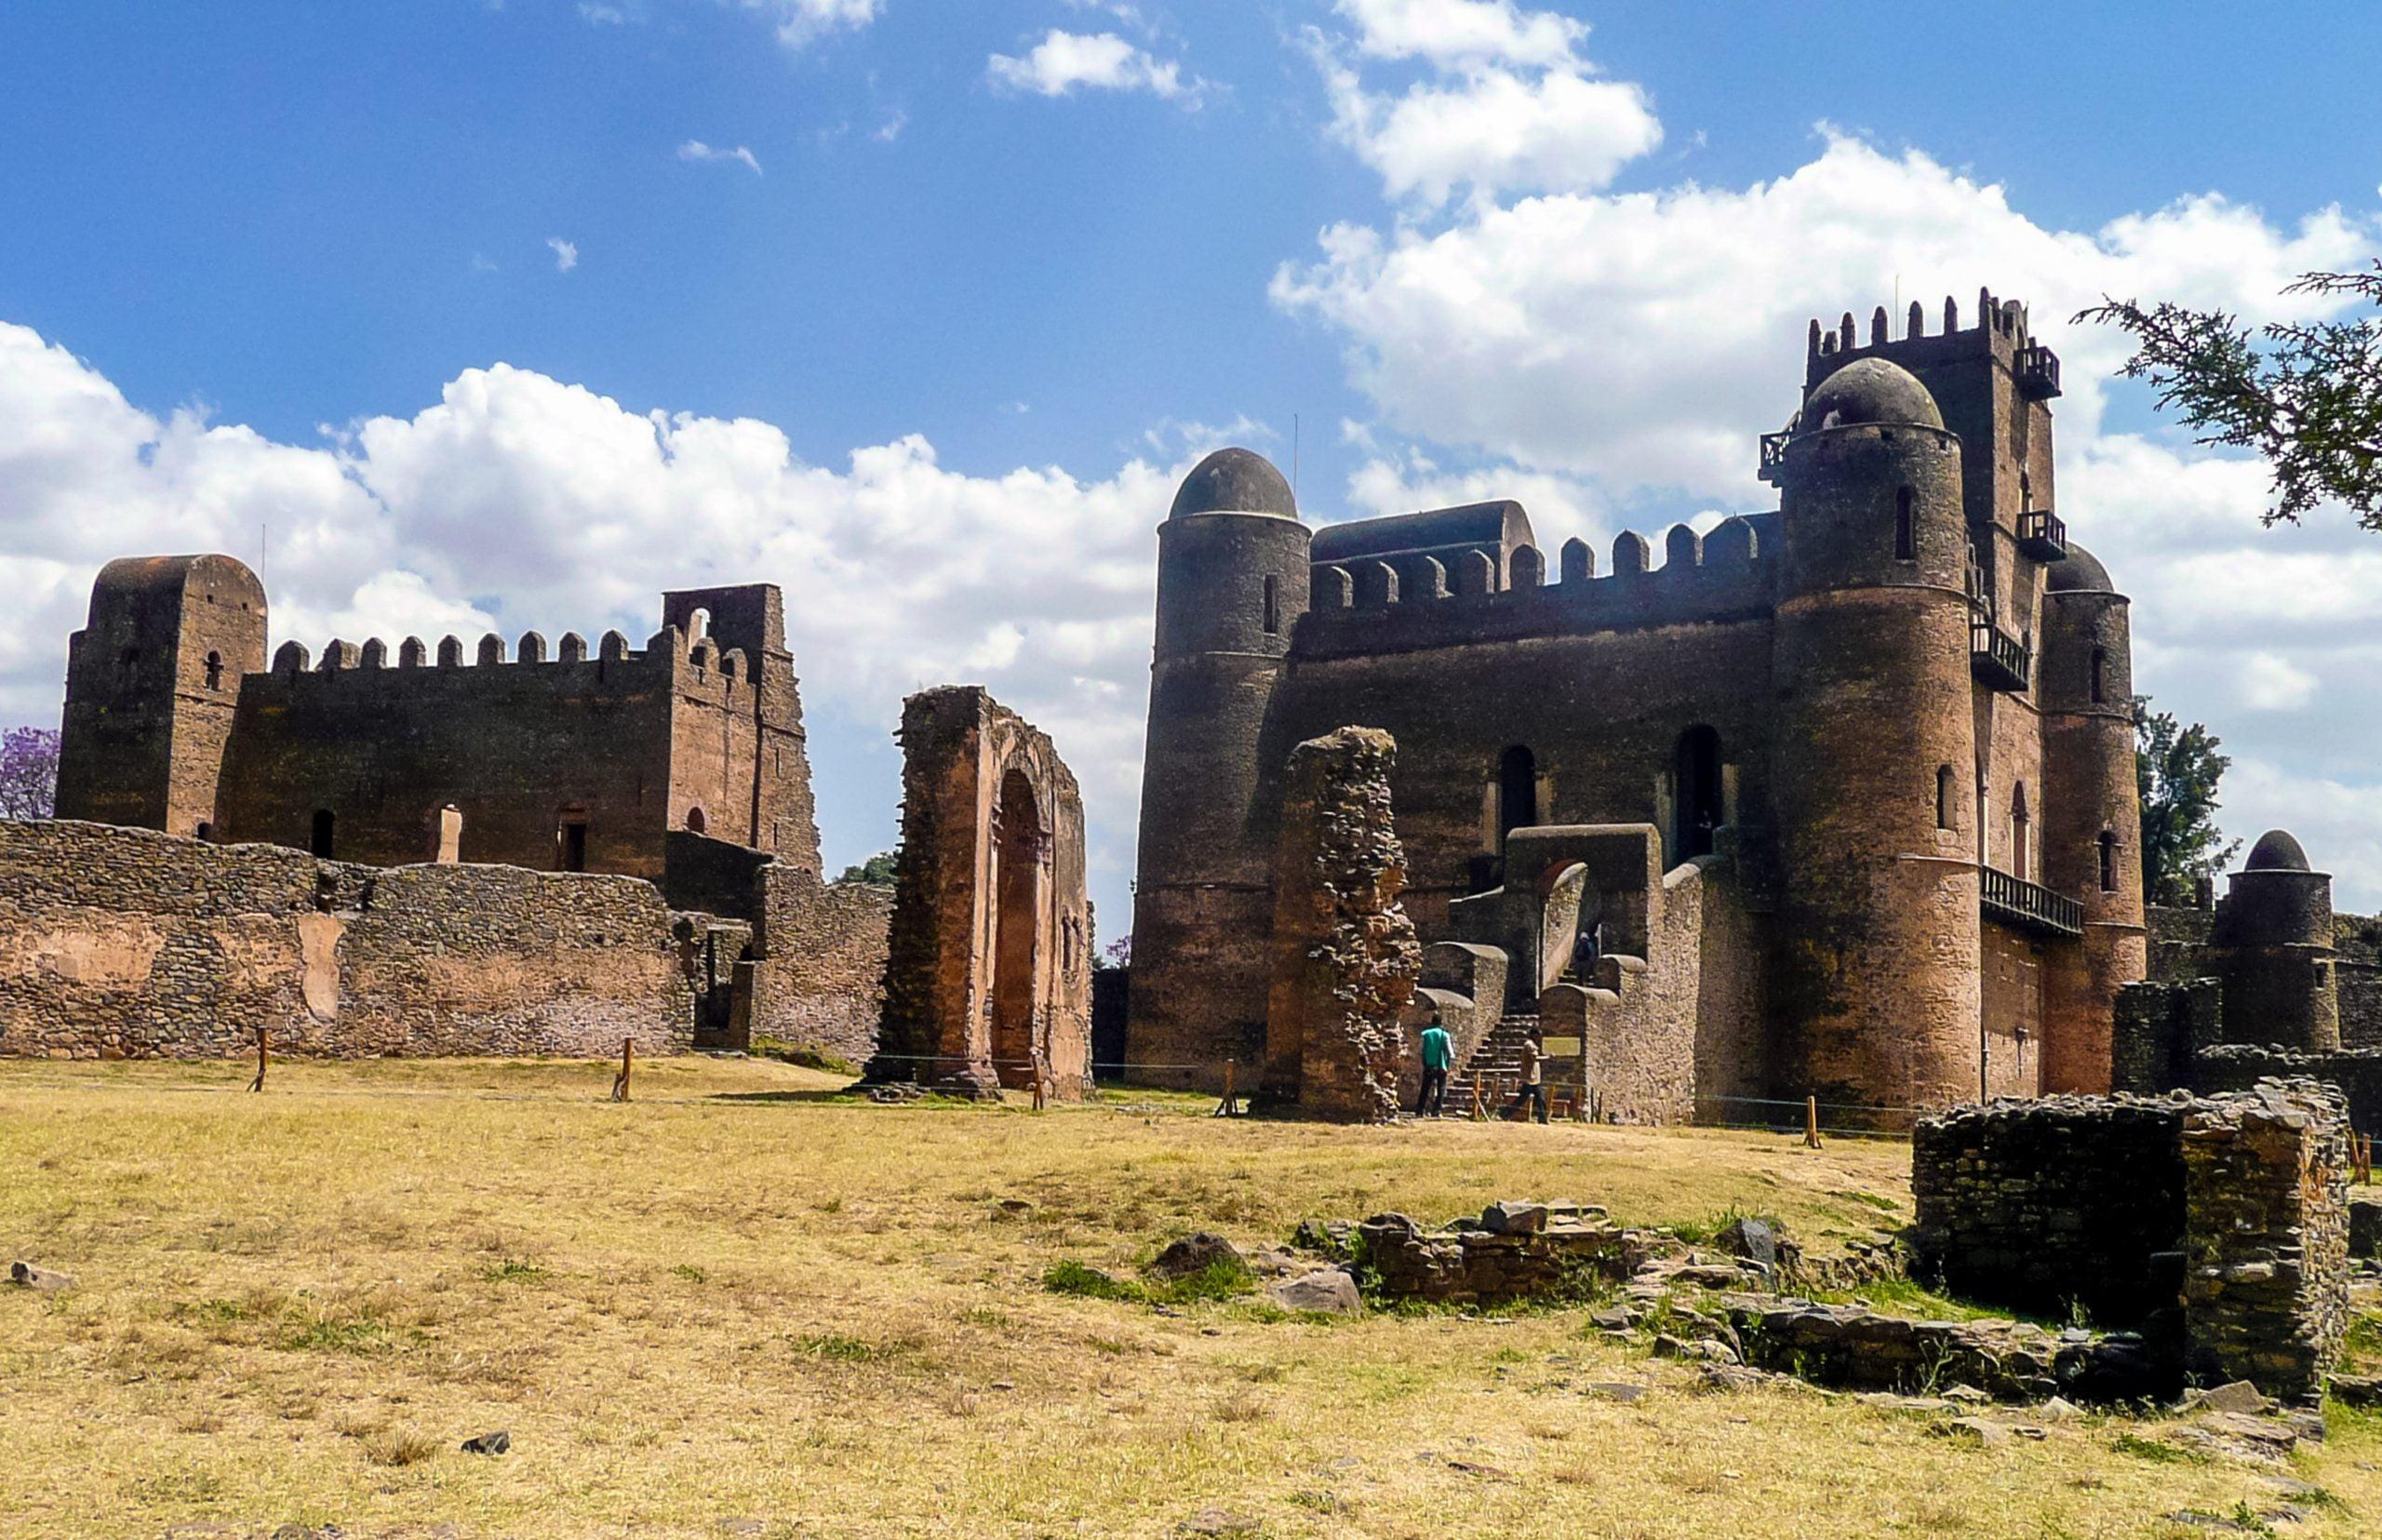 Royal ethiopian kings castle in Gondar, Ethiopia